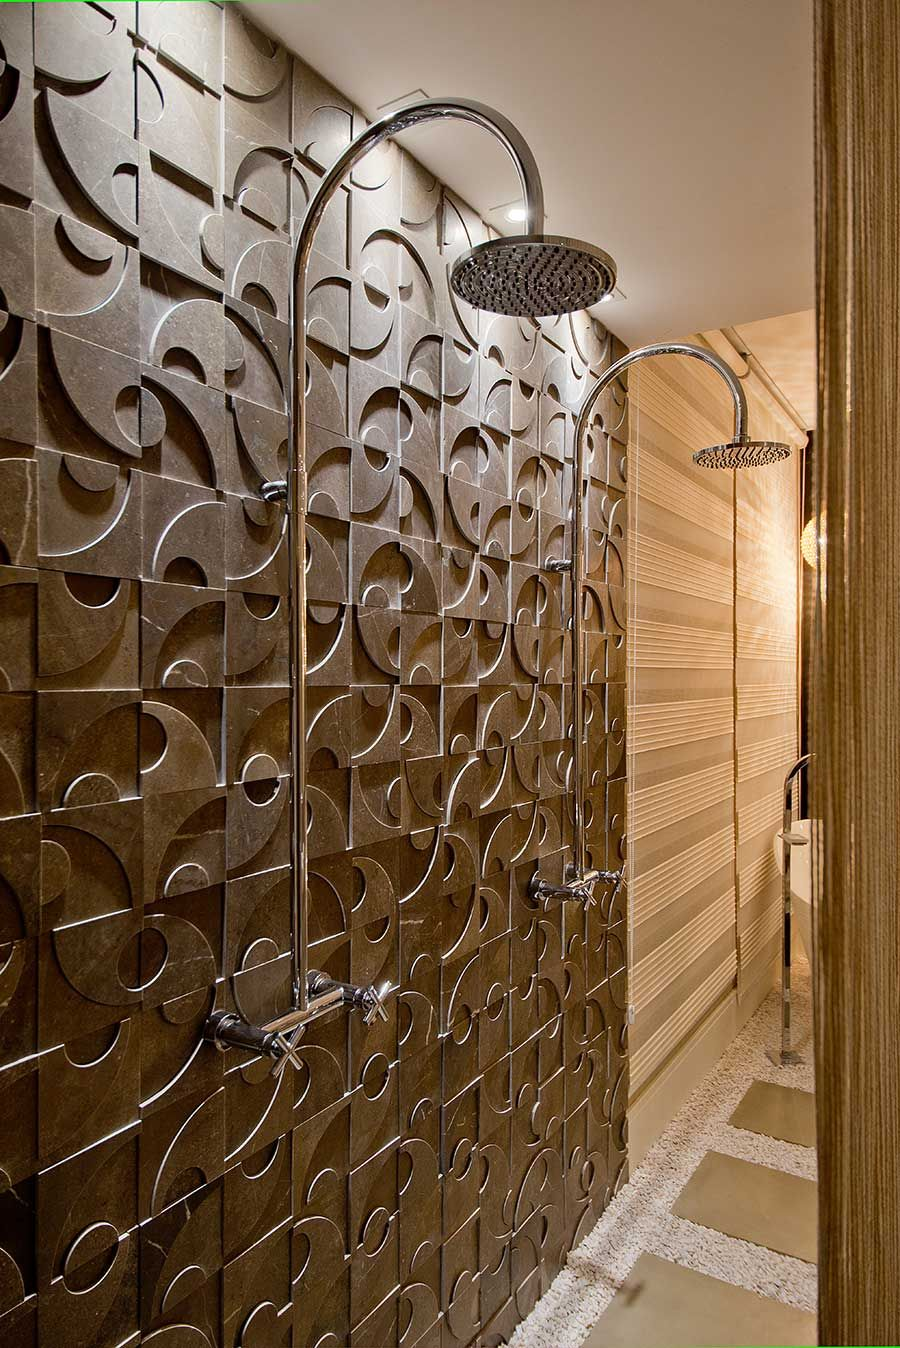 niteroi-grigio-shower-.jpg